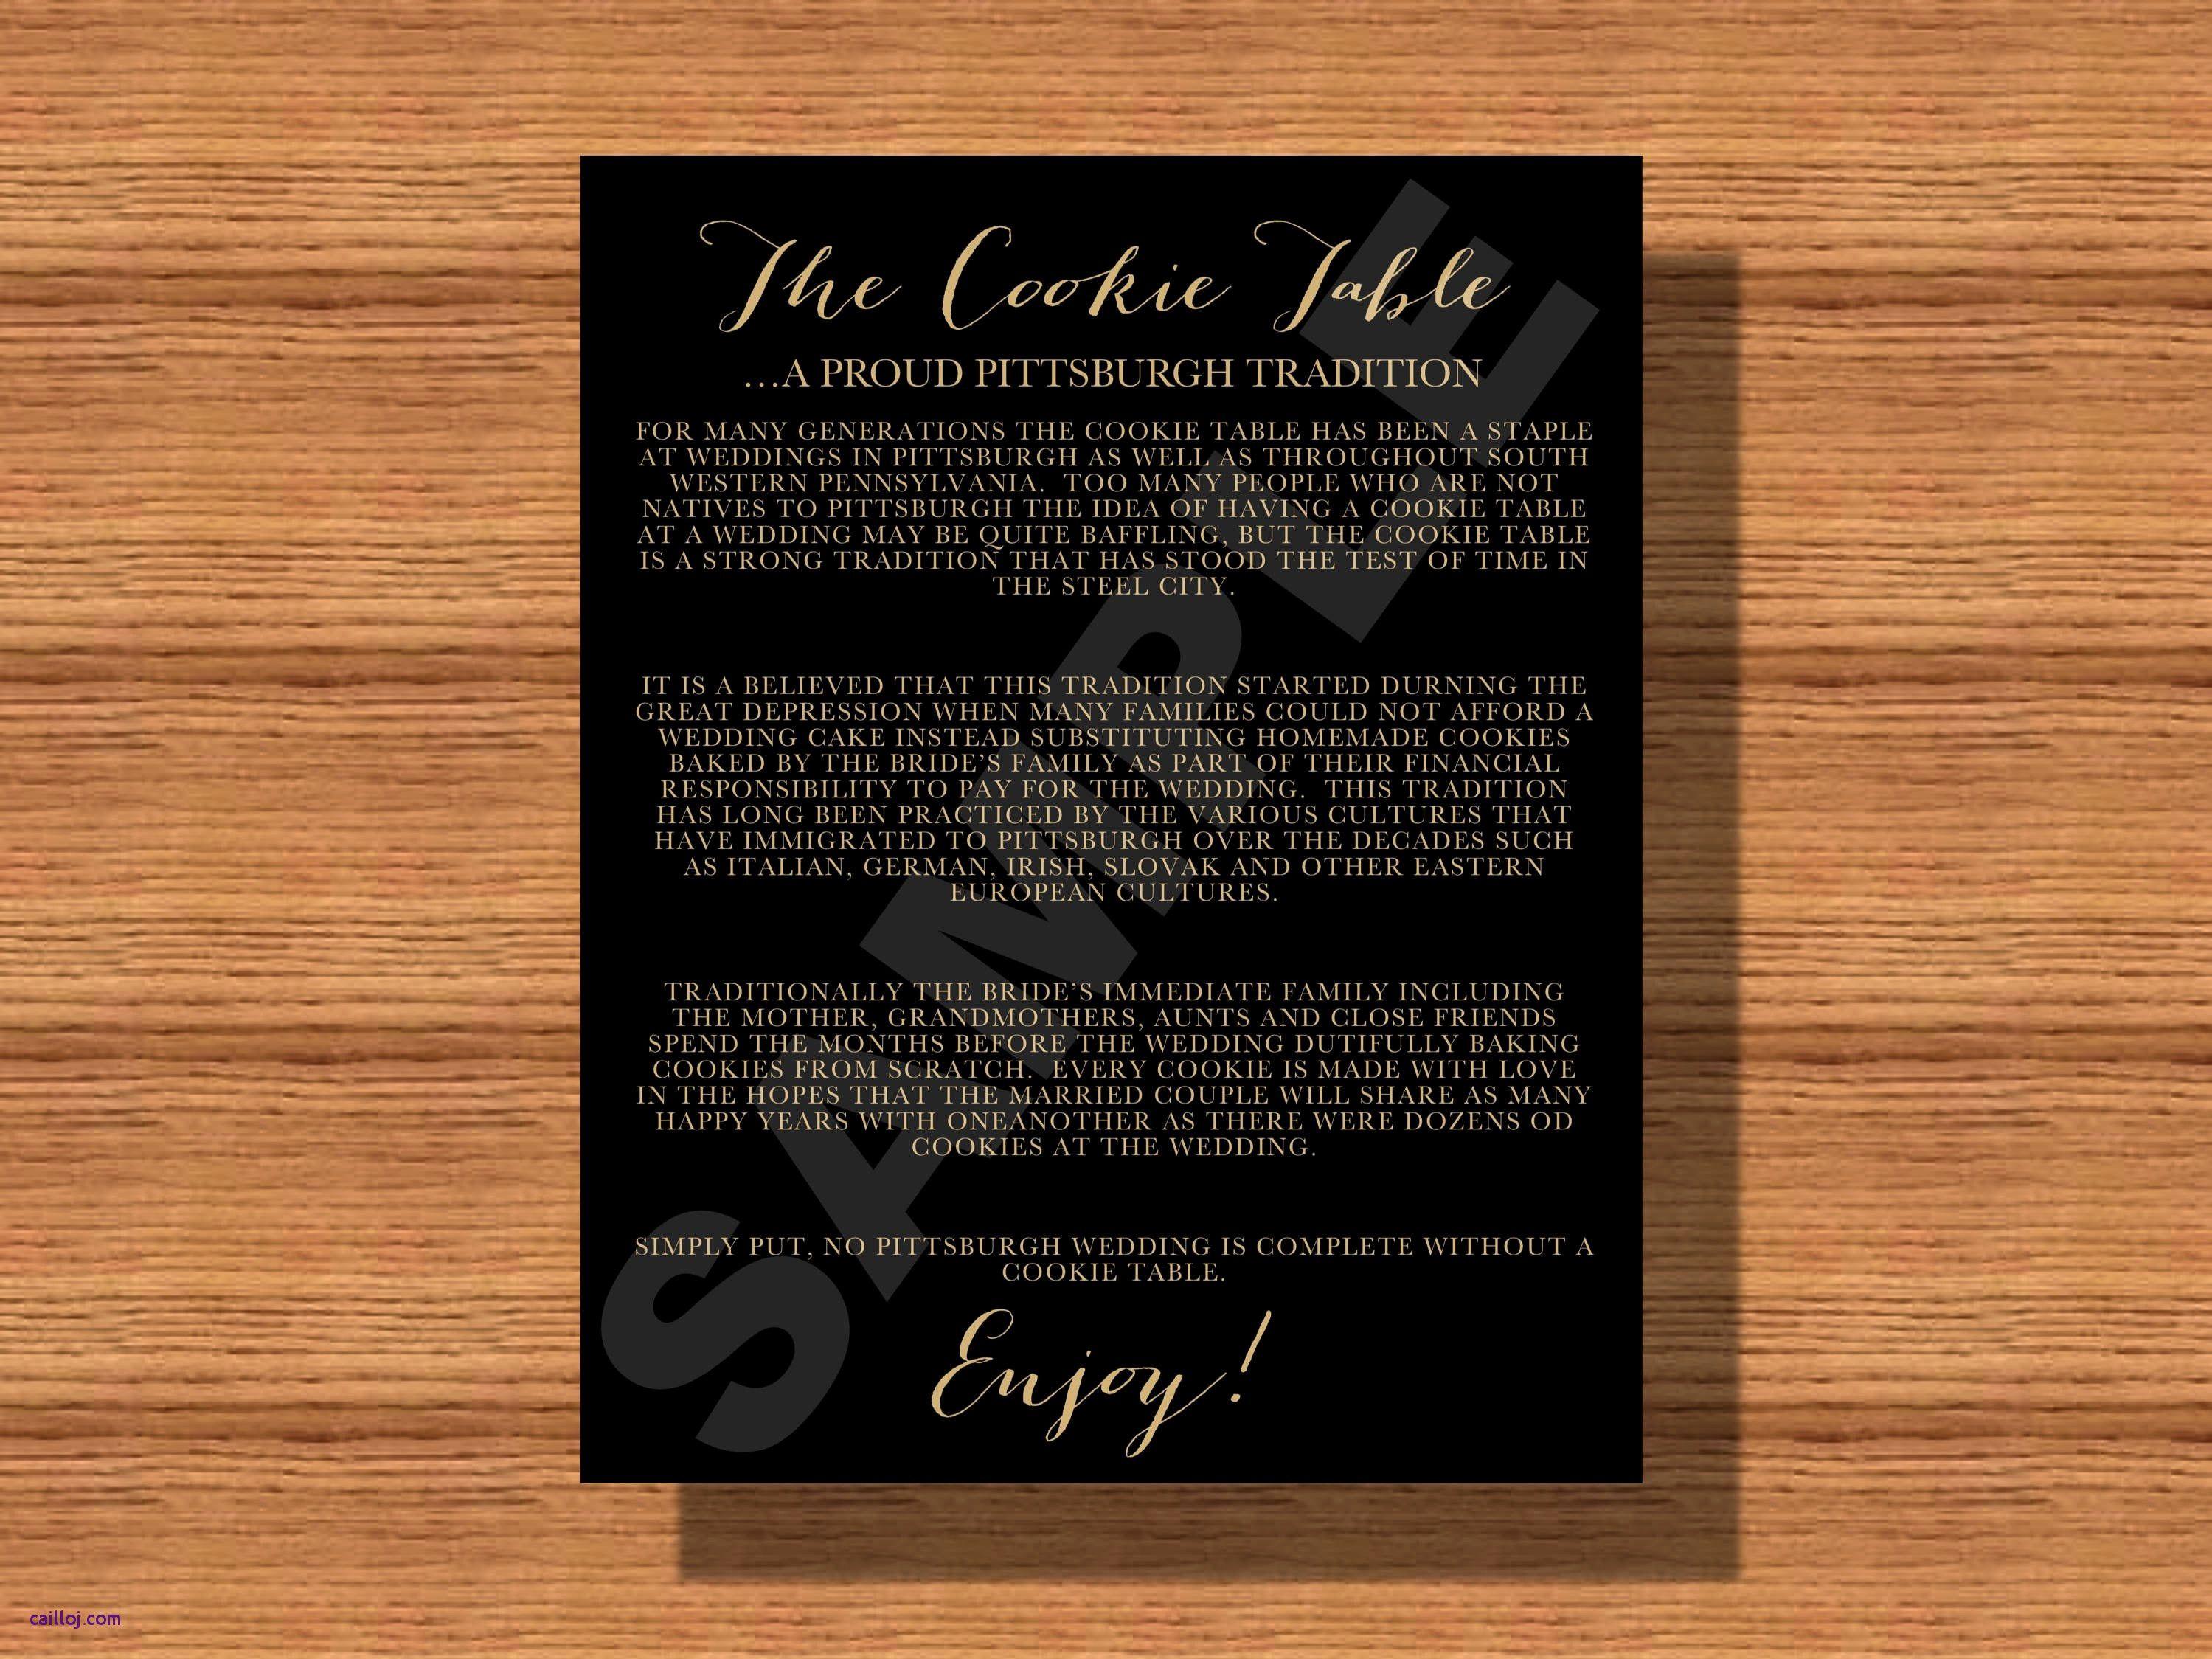 Luxury Carte Invitation Anniversaire 60 Ans Et Retraite Pittsburgh Wedding Cookie Table Party Invite Template Elegant Invitations